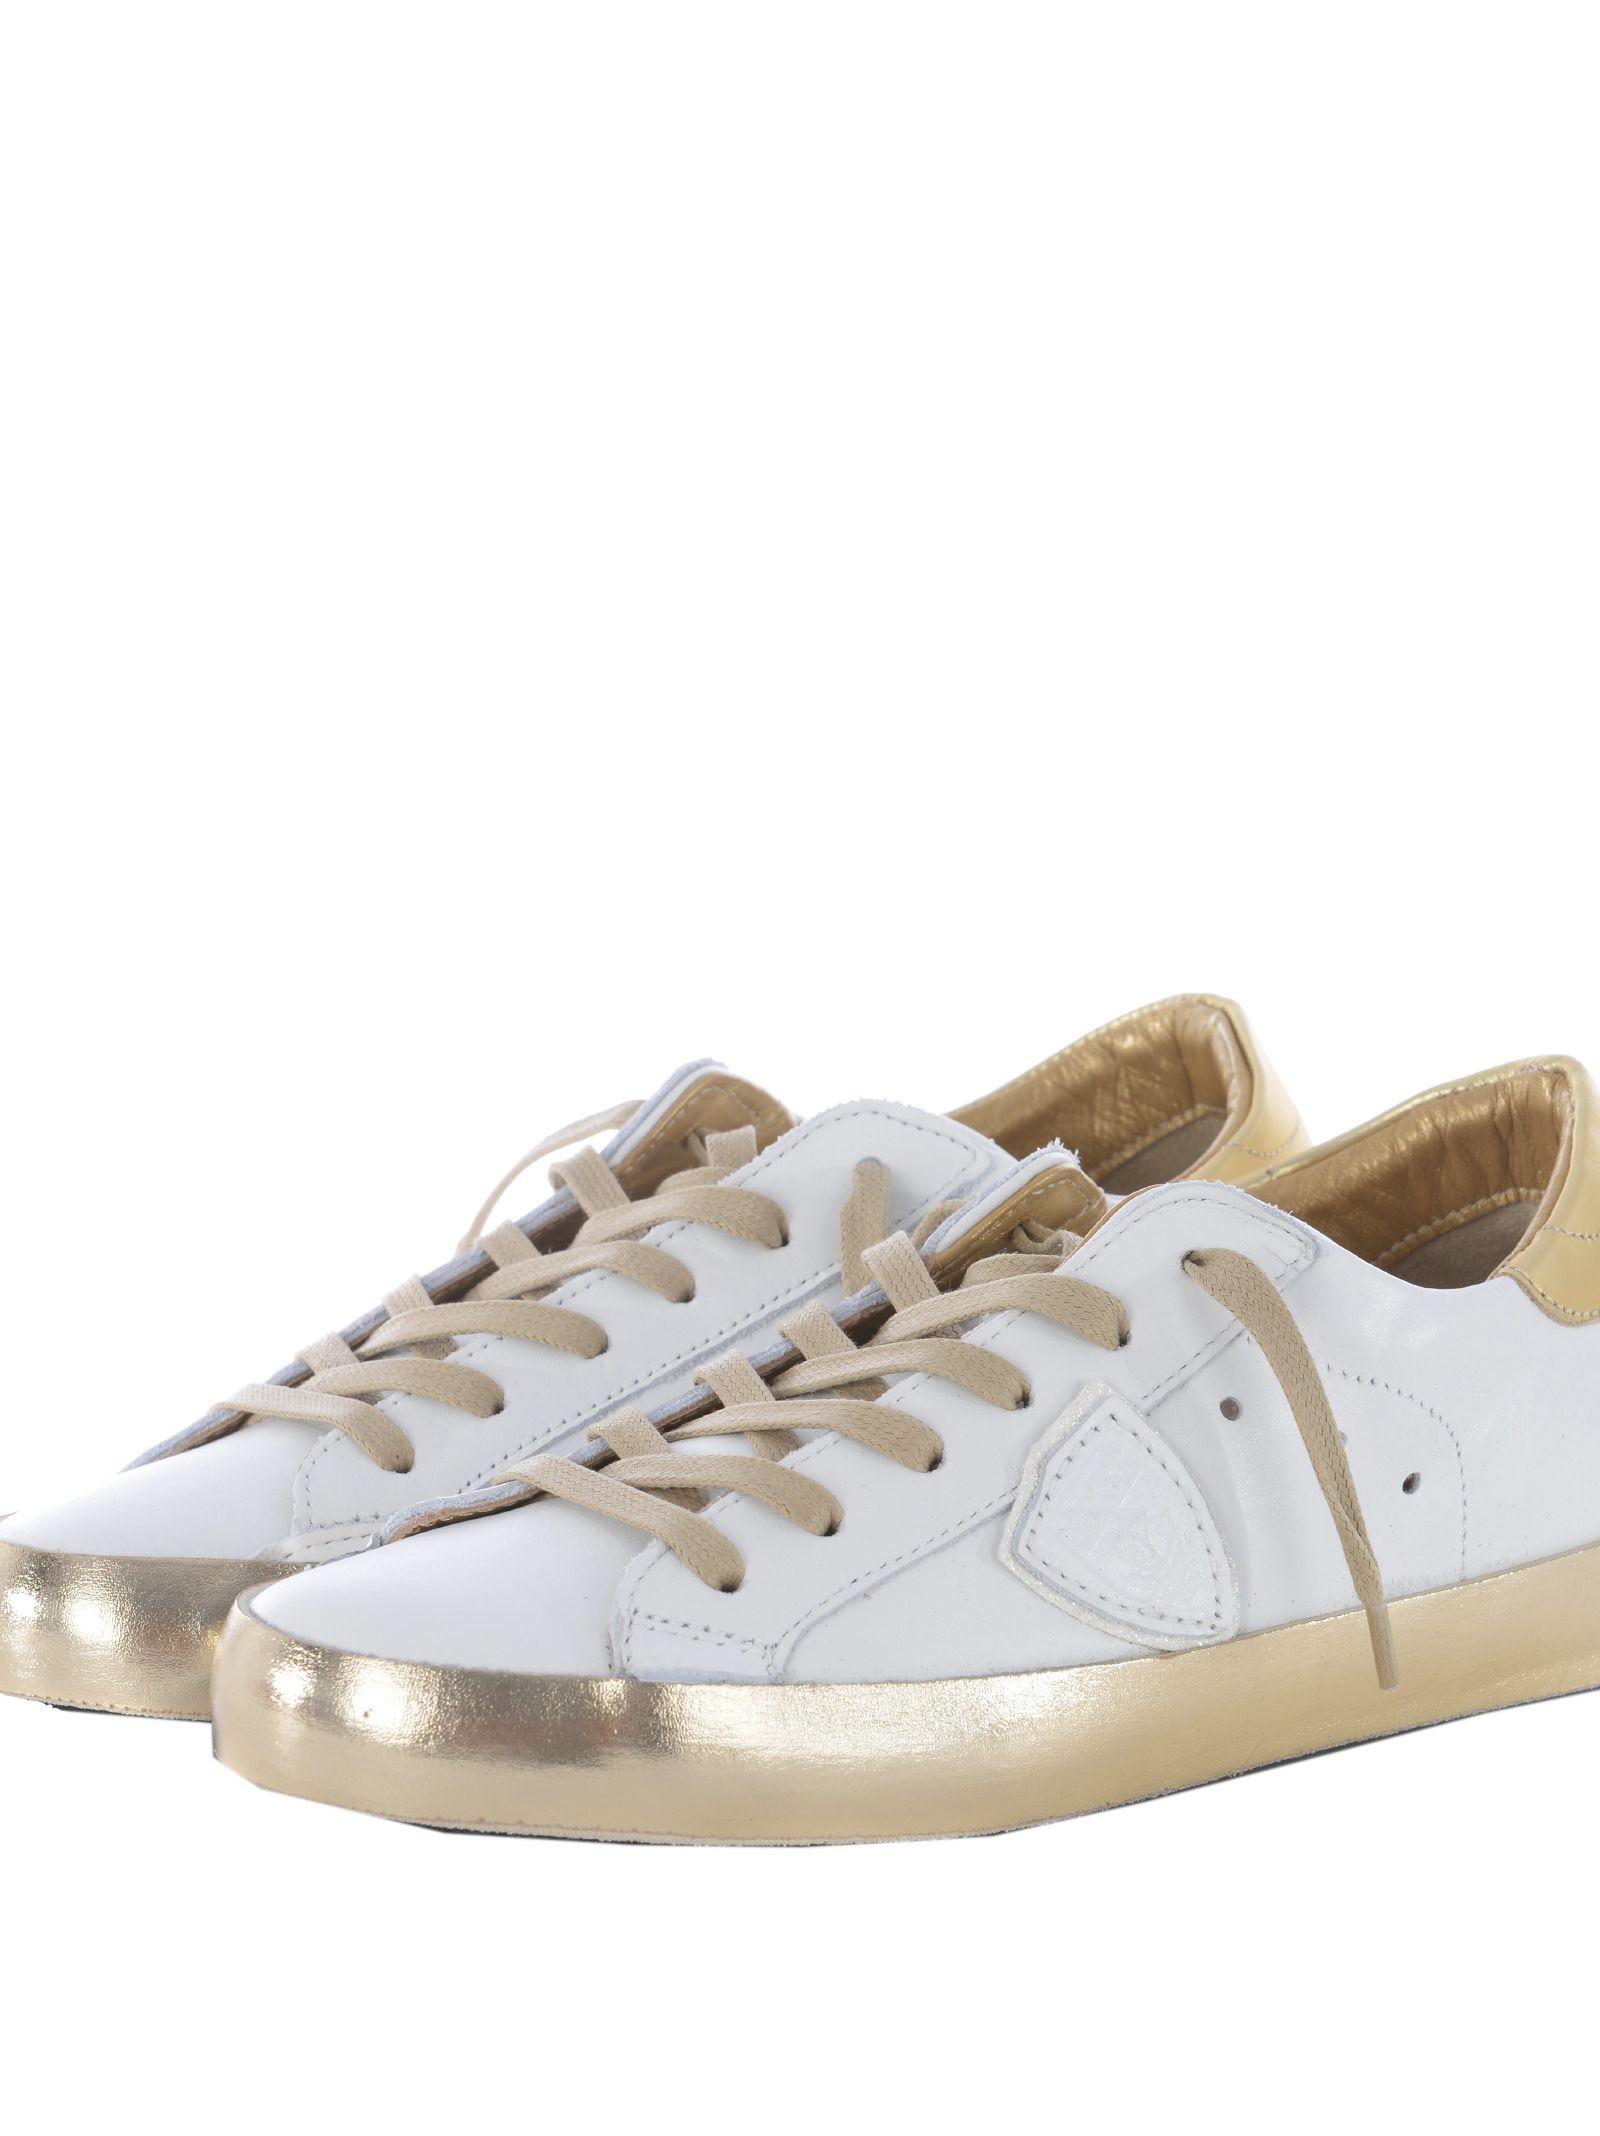 Philippe Model Metallic Detail Sneakers